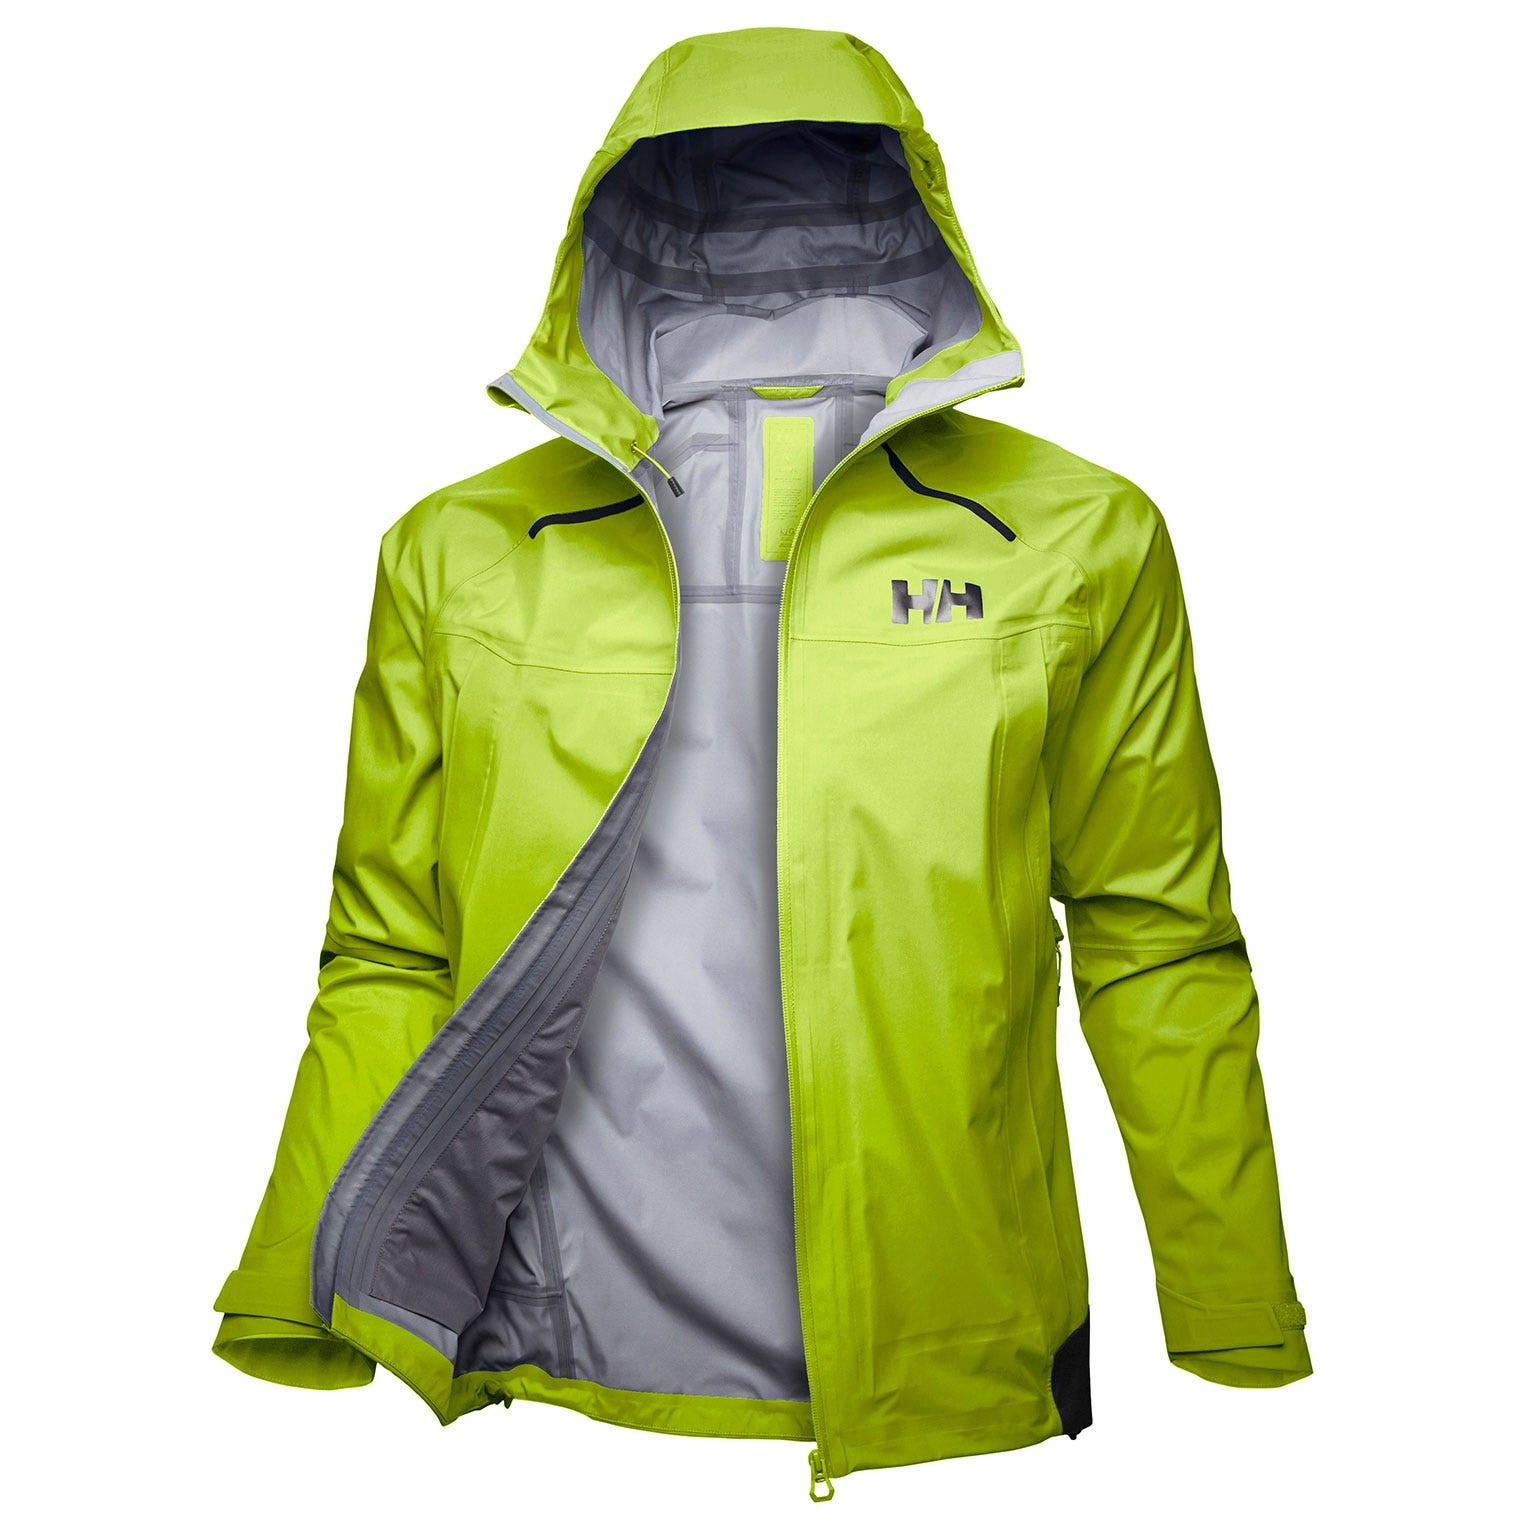 Helly Hansen Odin 9 Worlds Jacket Mens Hiking Yellow L